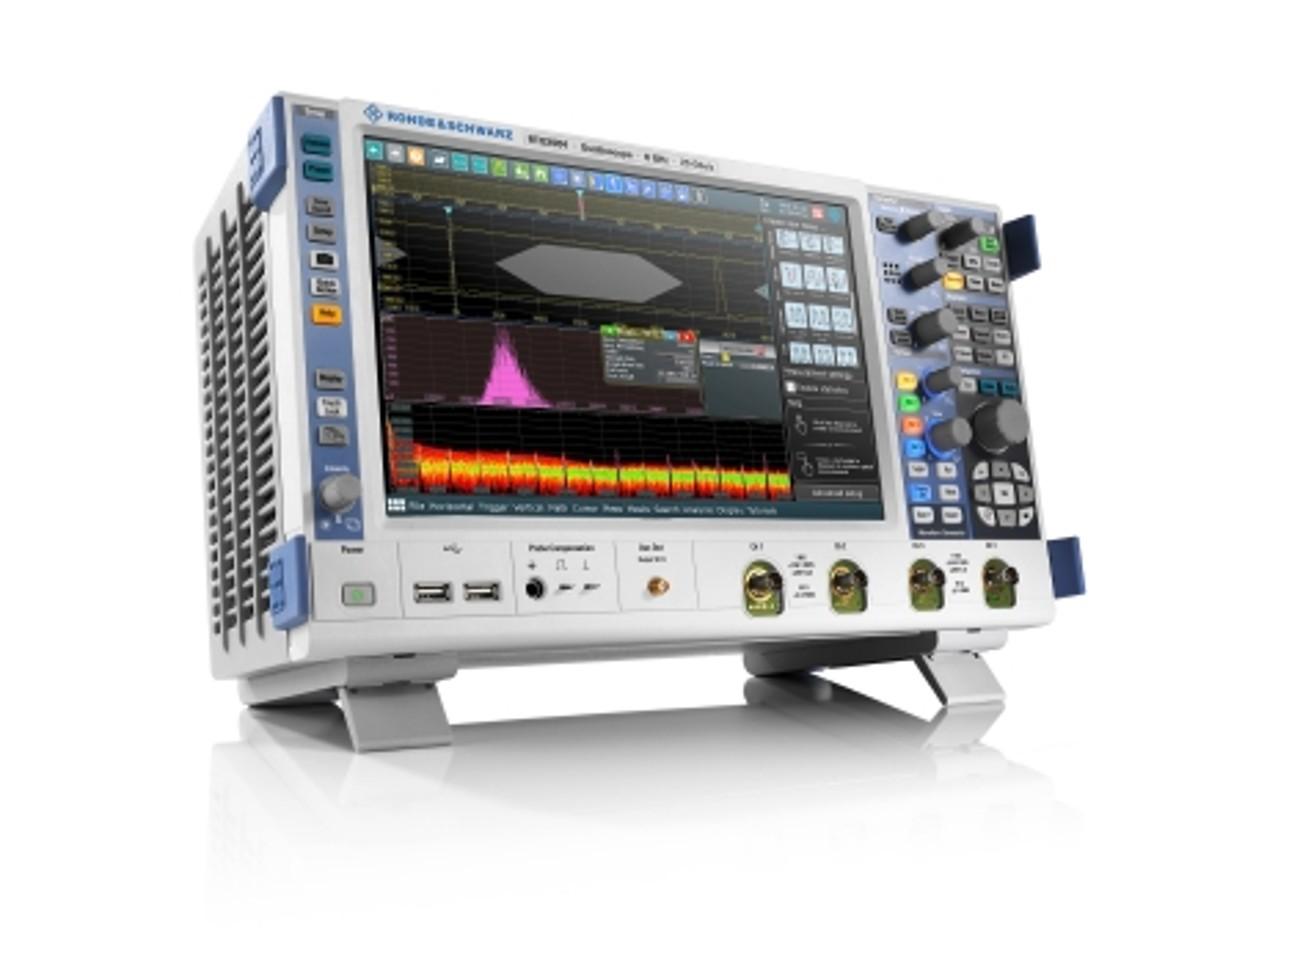 R&S RTO digital oscilloscope